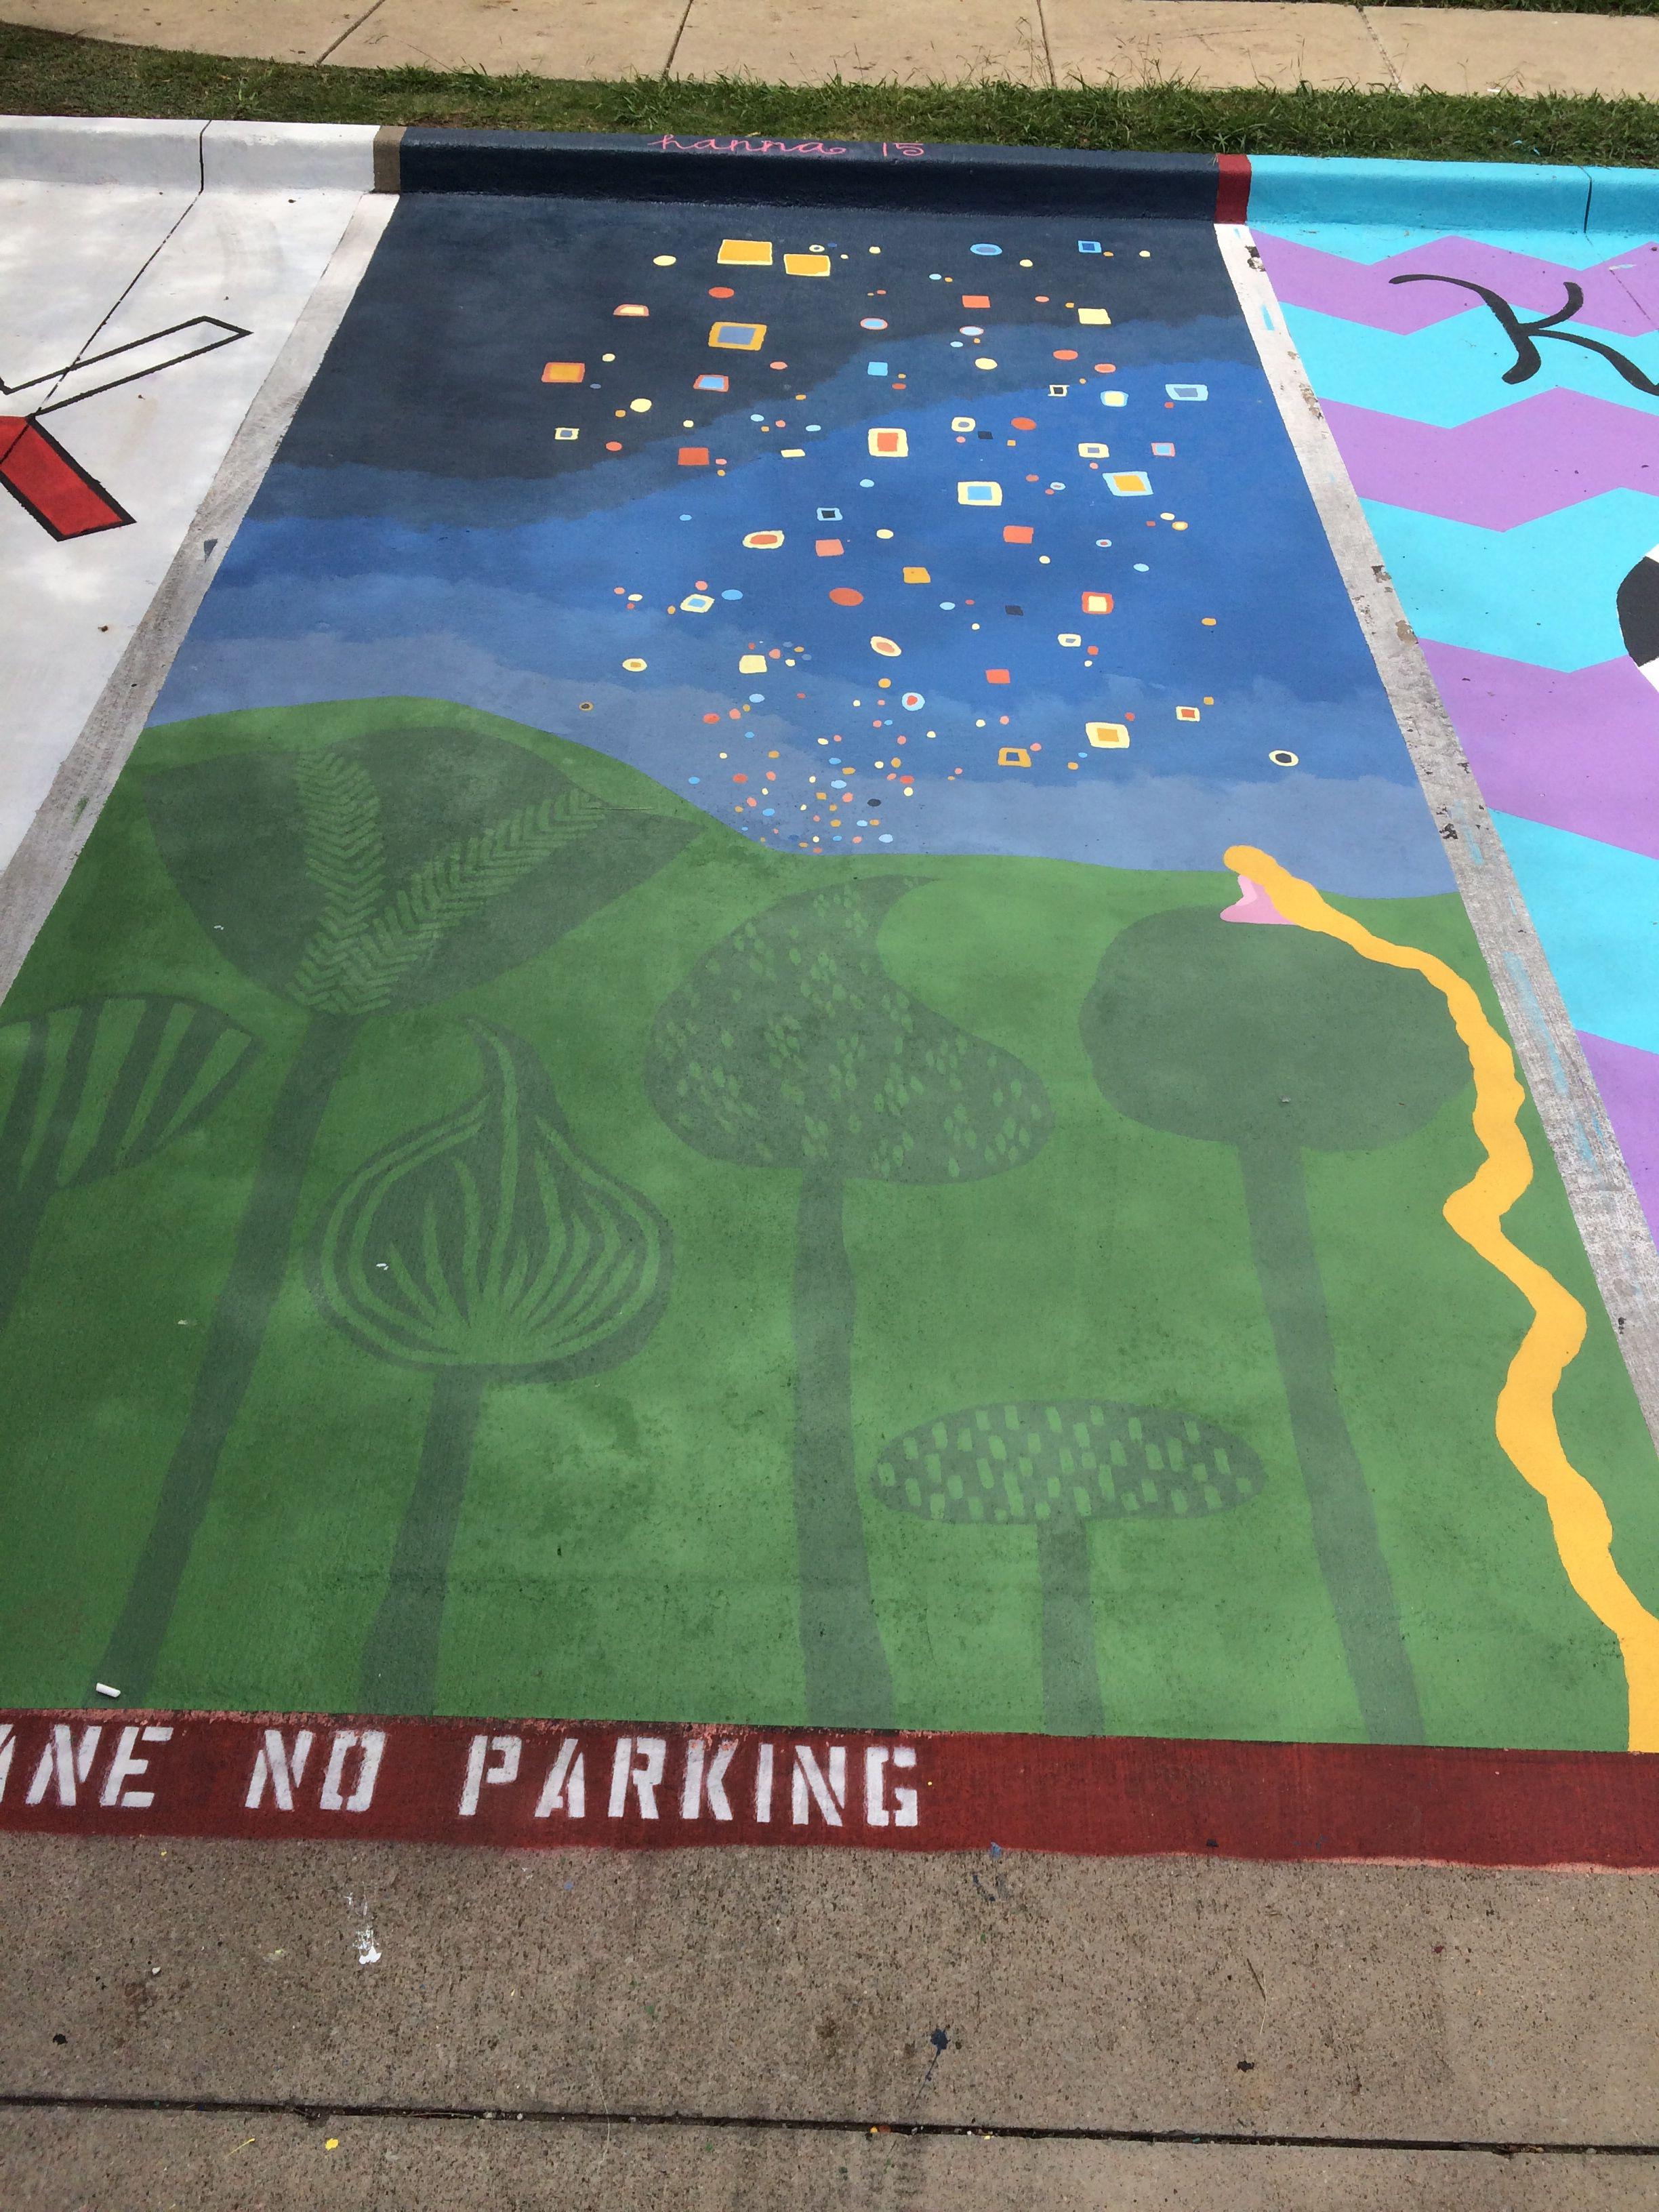 Tangled Senior Spot Parking Spot Painting Parking Lot Painting Crafts For Seniors